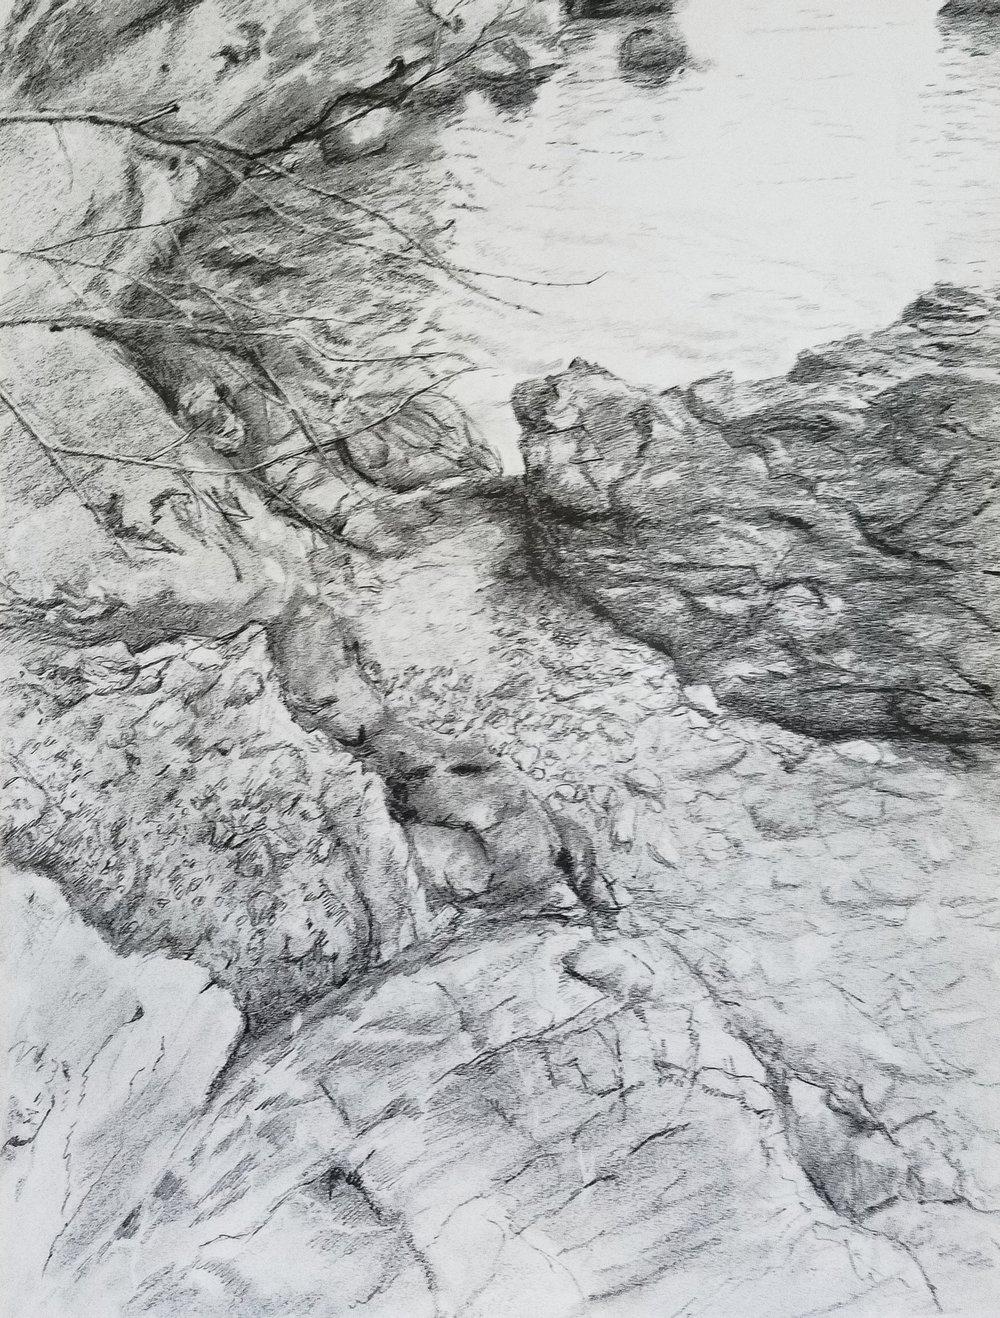 Beach Pebbles, Tellaro, Italy; graphite; 2018